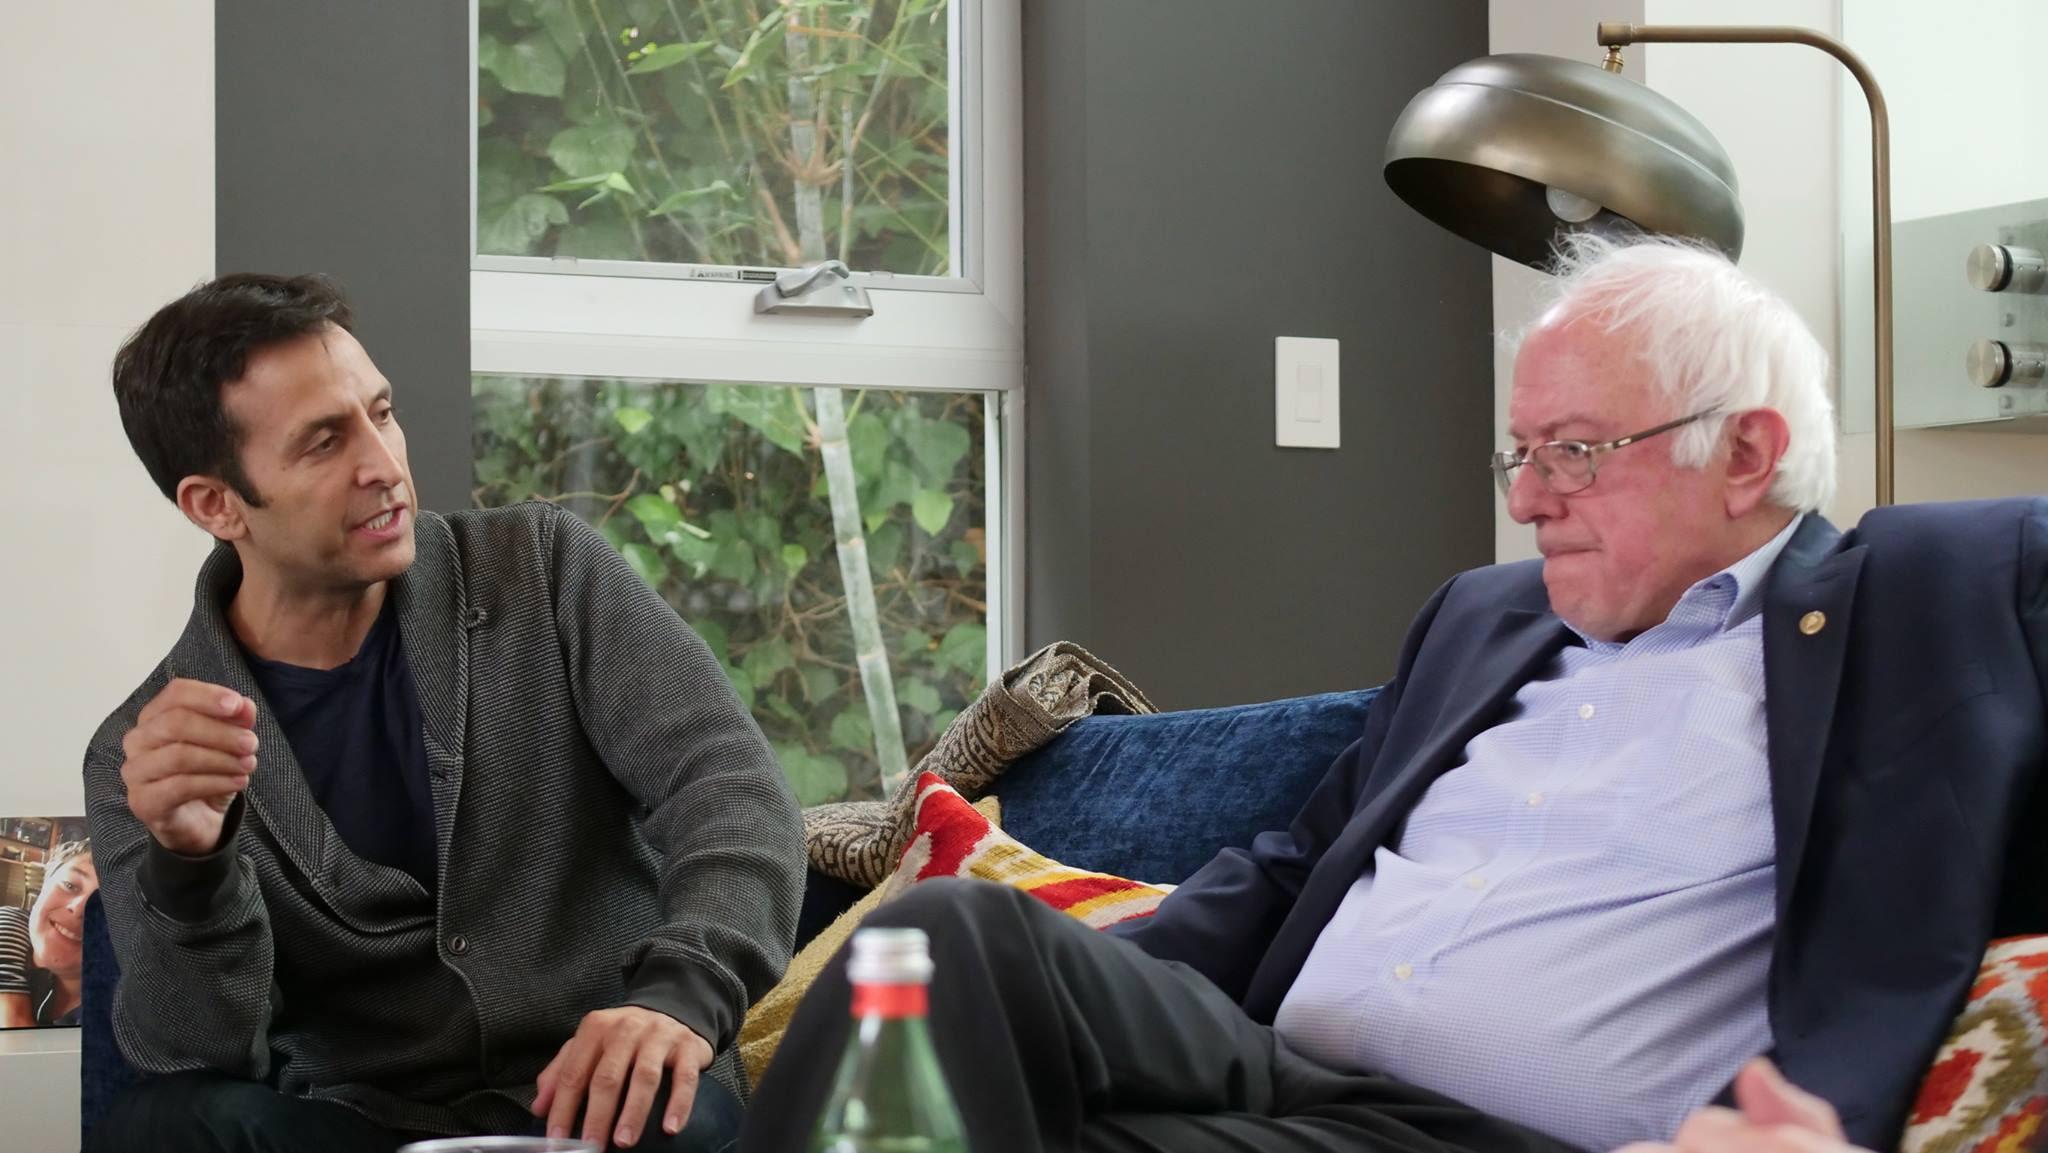 Roger Wolfson & Bernie Sanders.jpg